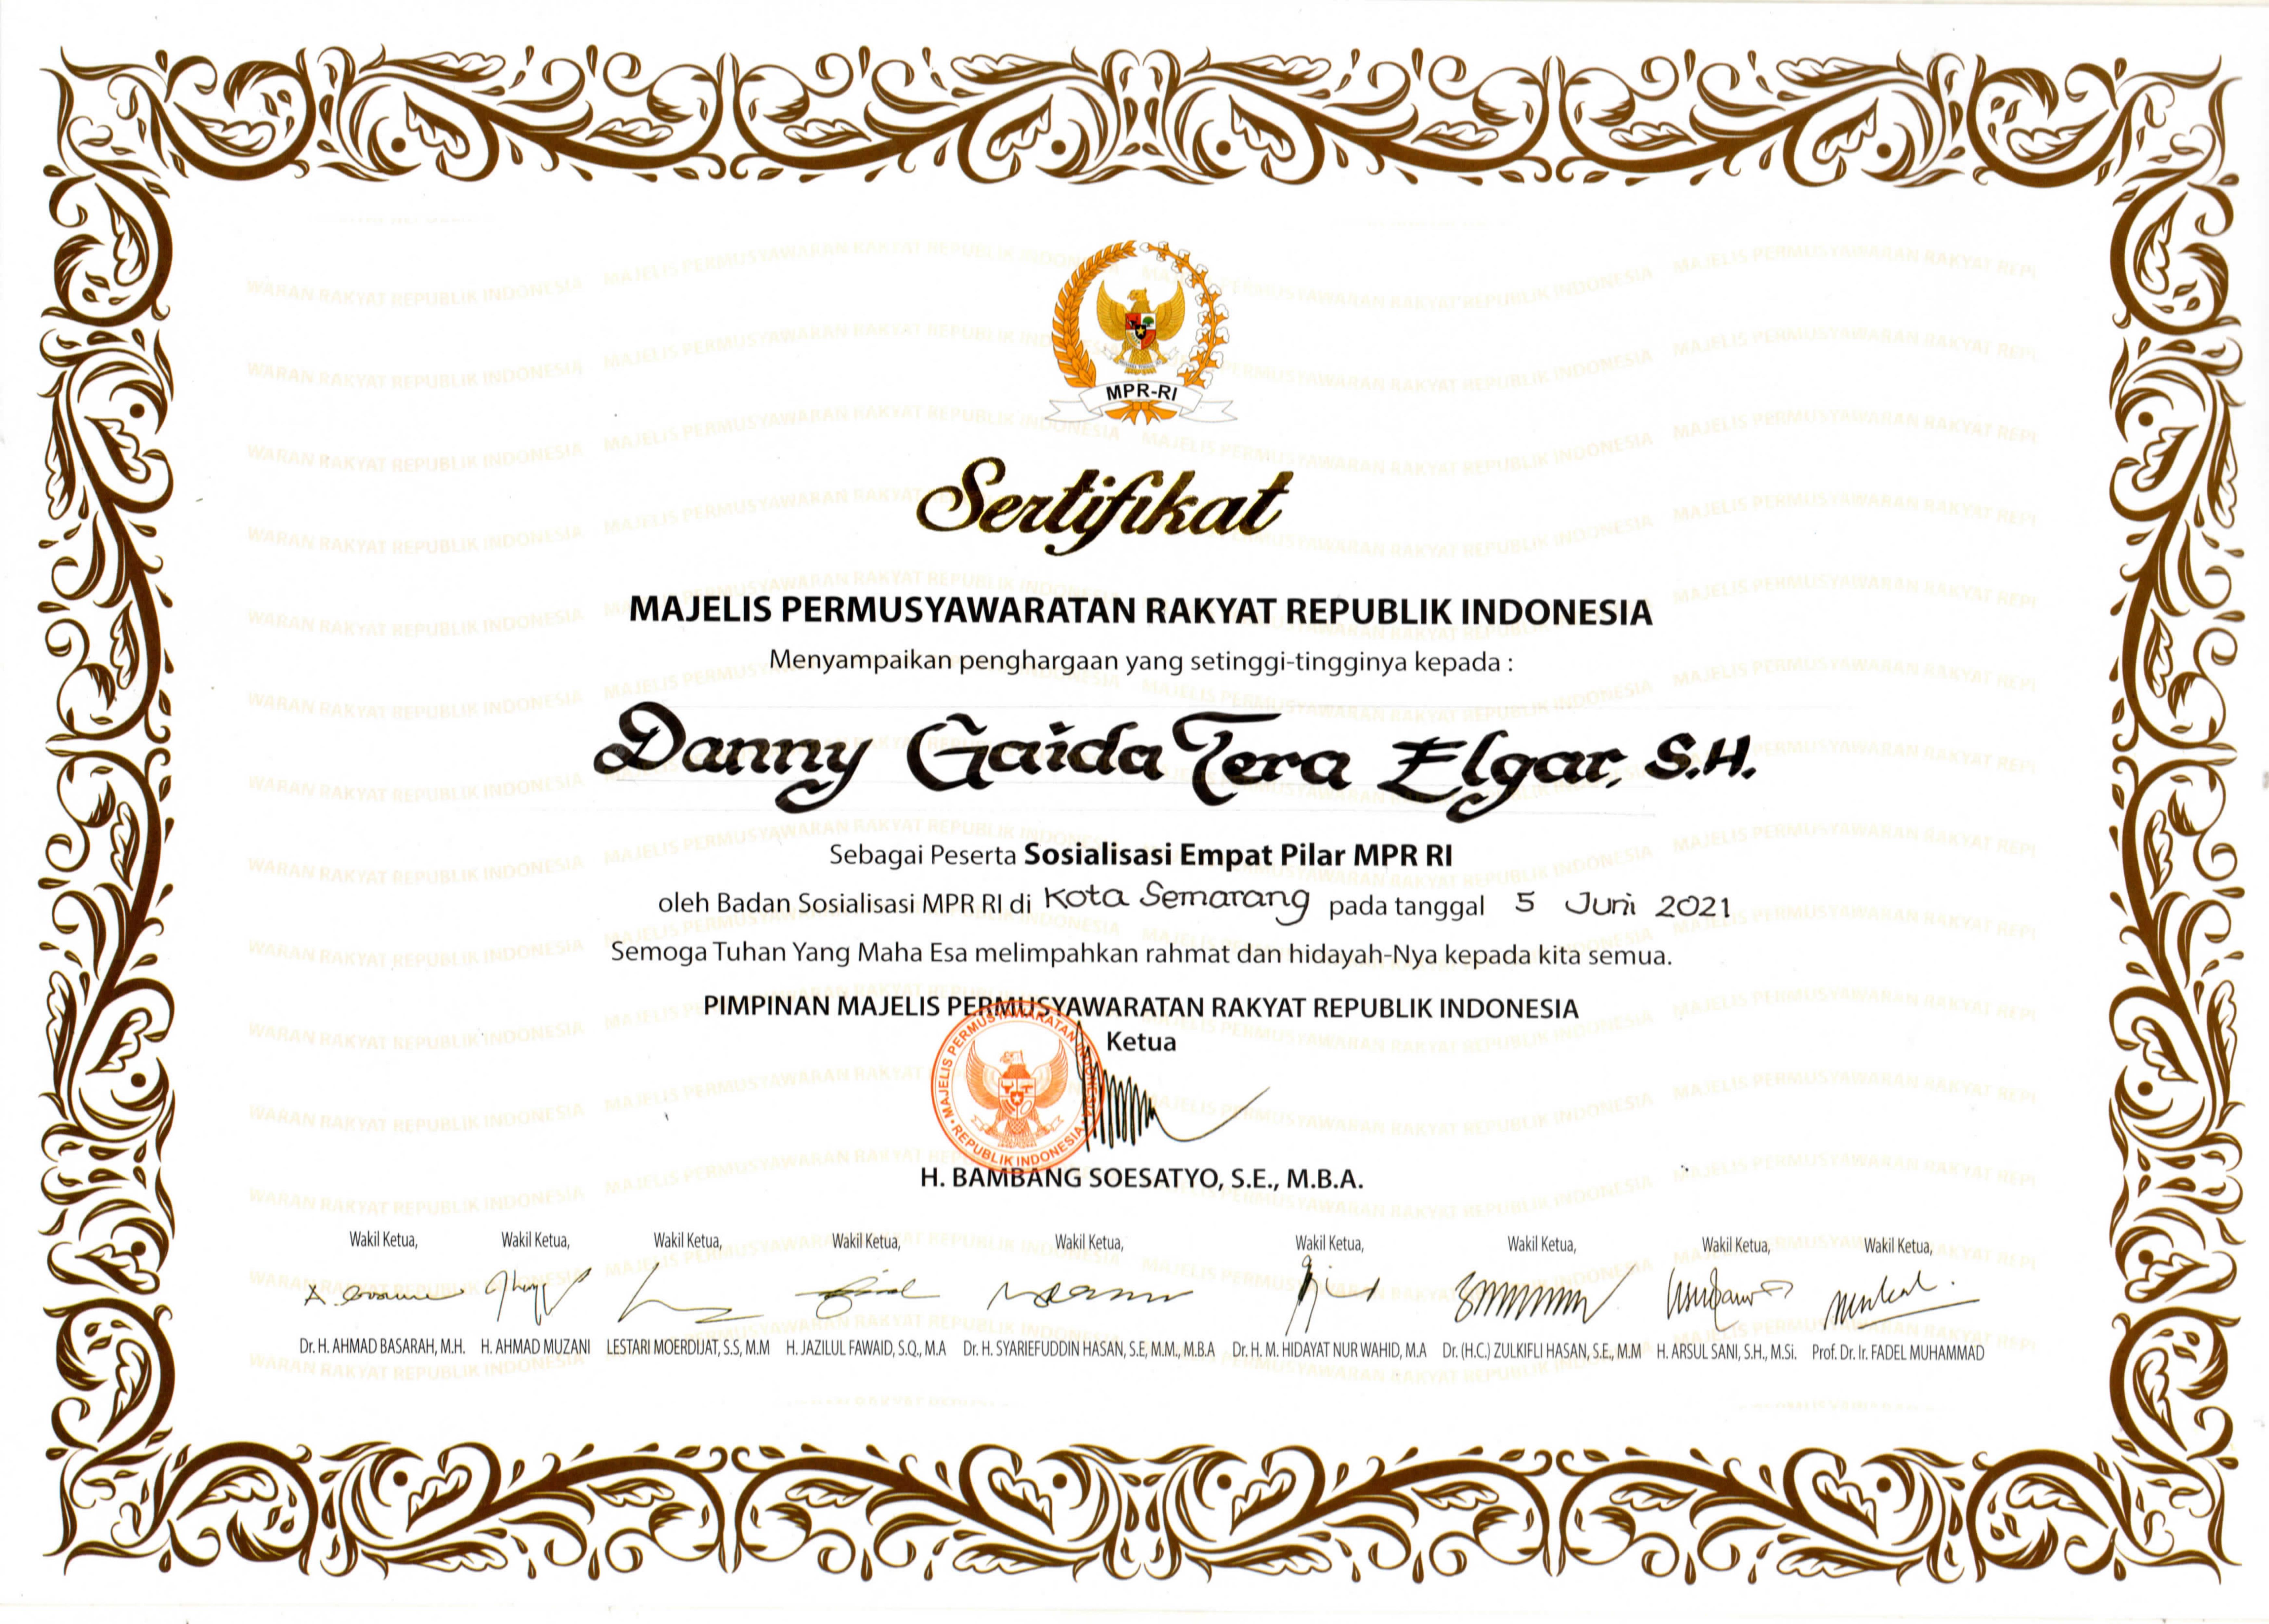 Sertifikat Majelis Permusyawaratan Rakyat Republik Indonesia (SOSIALISASI 4 PILAR MPR RI)